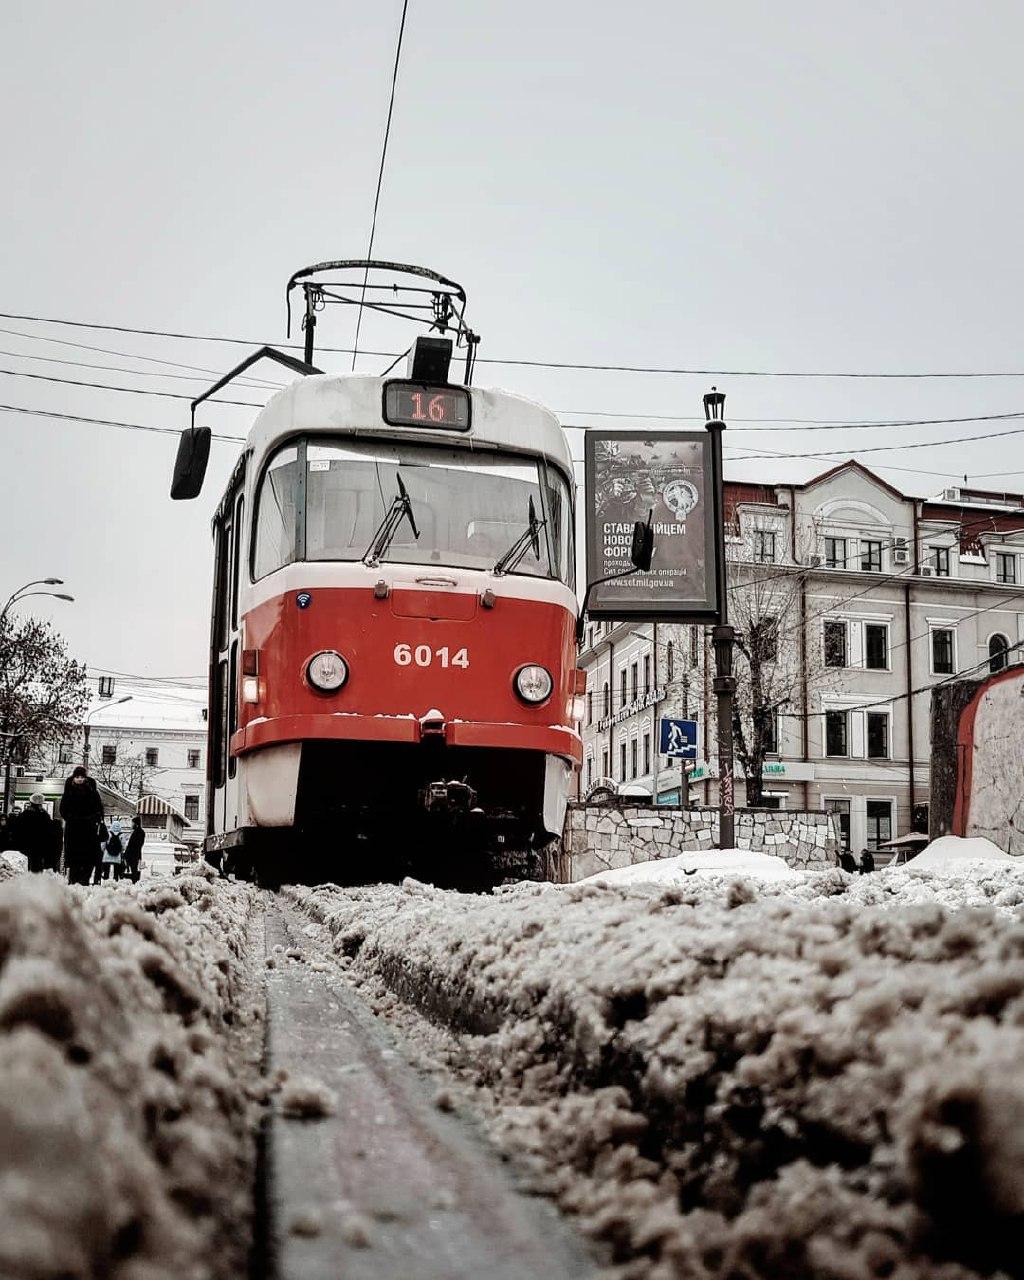 Зимой трамвайчикам так же холодно, как и людям. Фото: @valik_chern